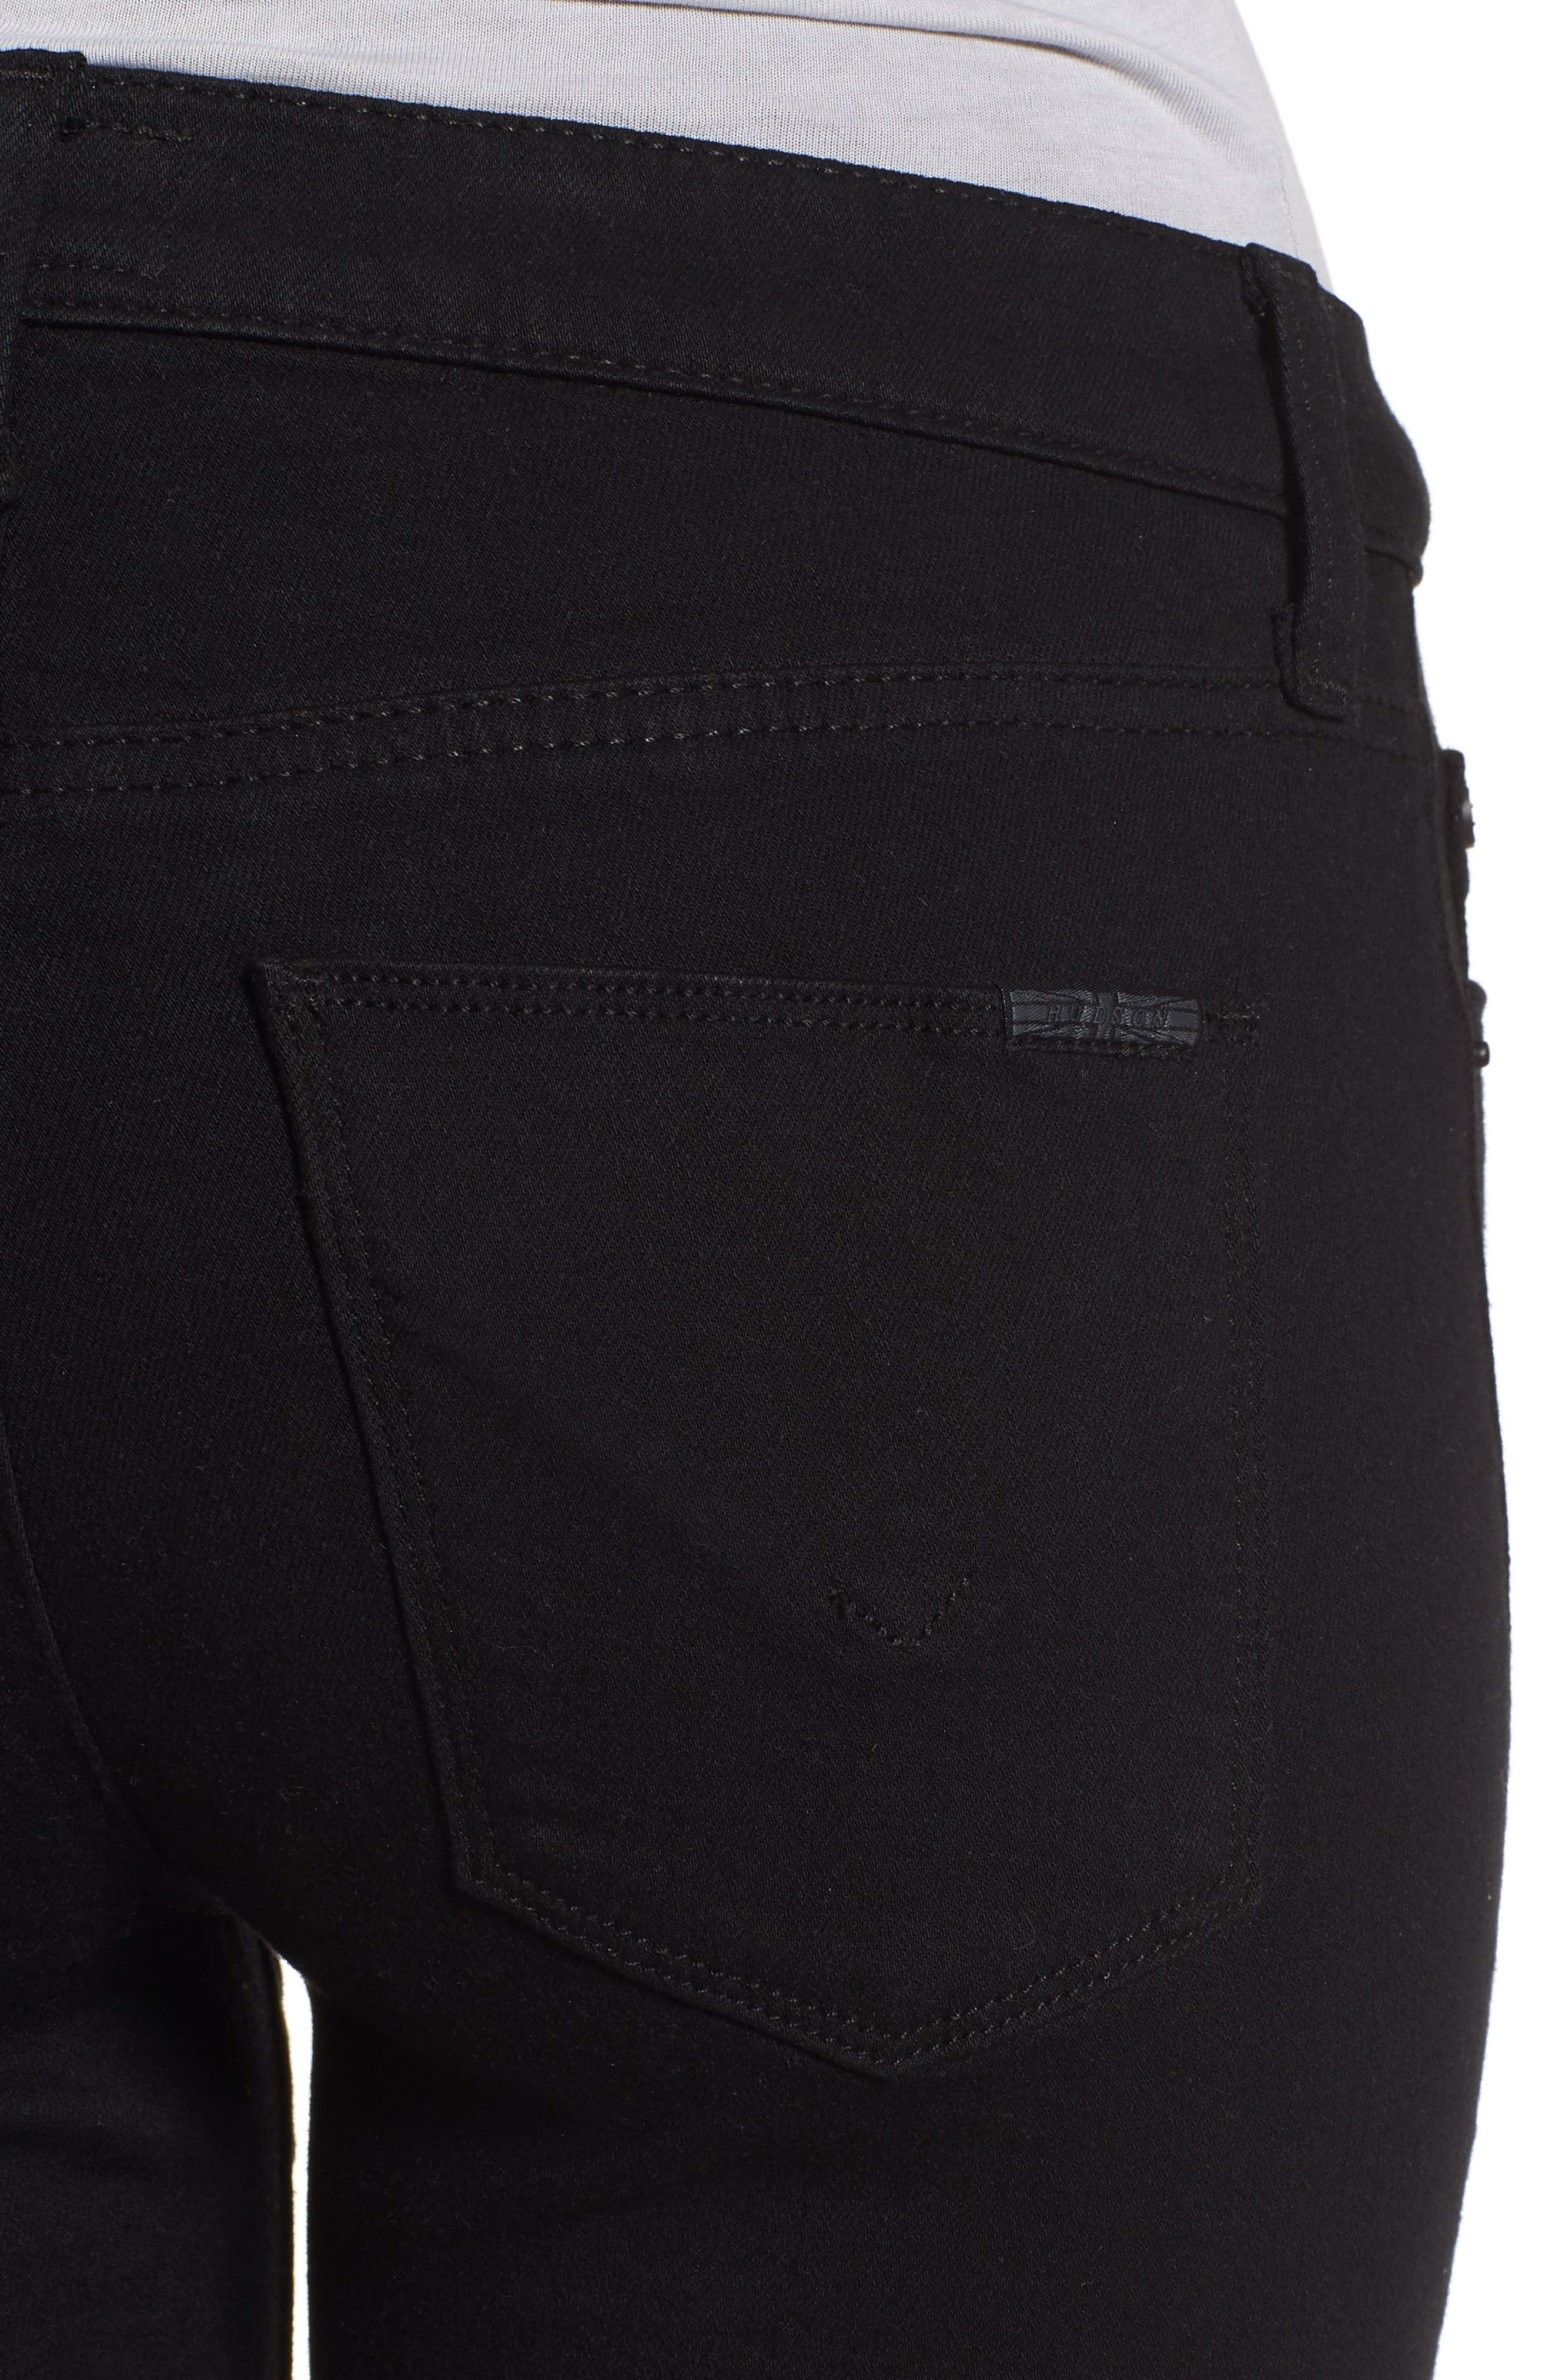 Amelia Cutoff Knee Shorts,                             Alternate thumbnail 4, color,                             Black